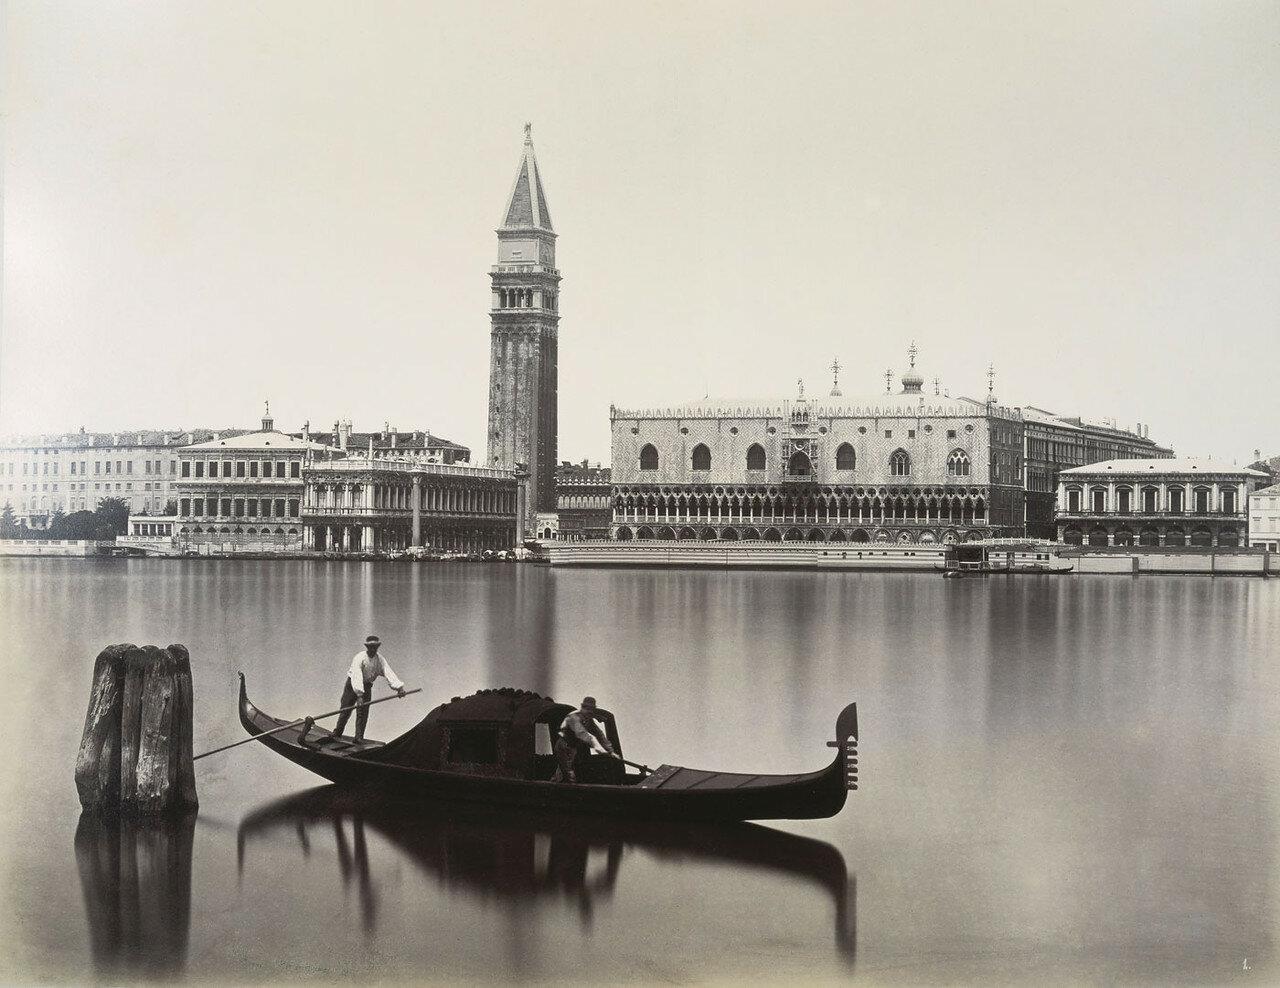 Вид на Библиотеку Марчиана, Кампанилу собора Святого Марка и Дворец Дожей  с острова Сан-Джорджо Маджоре. 1875